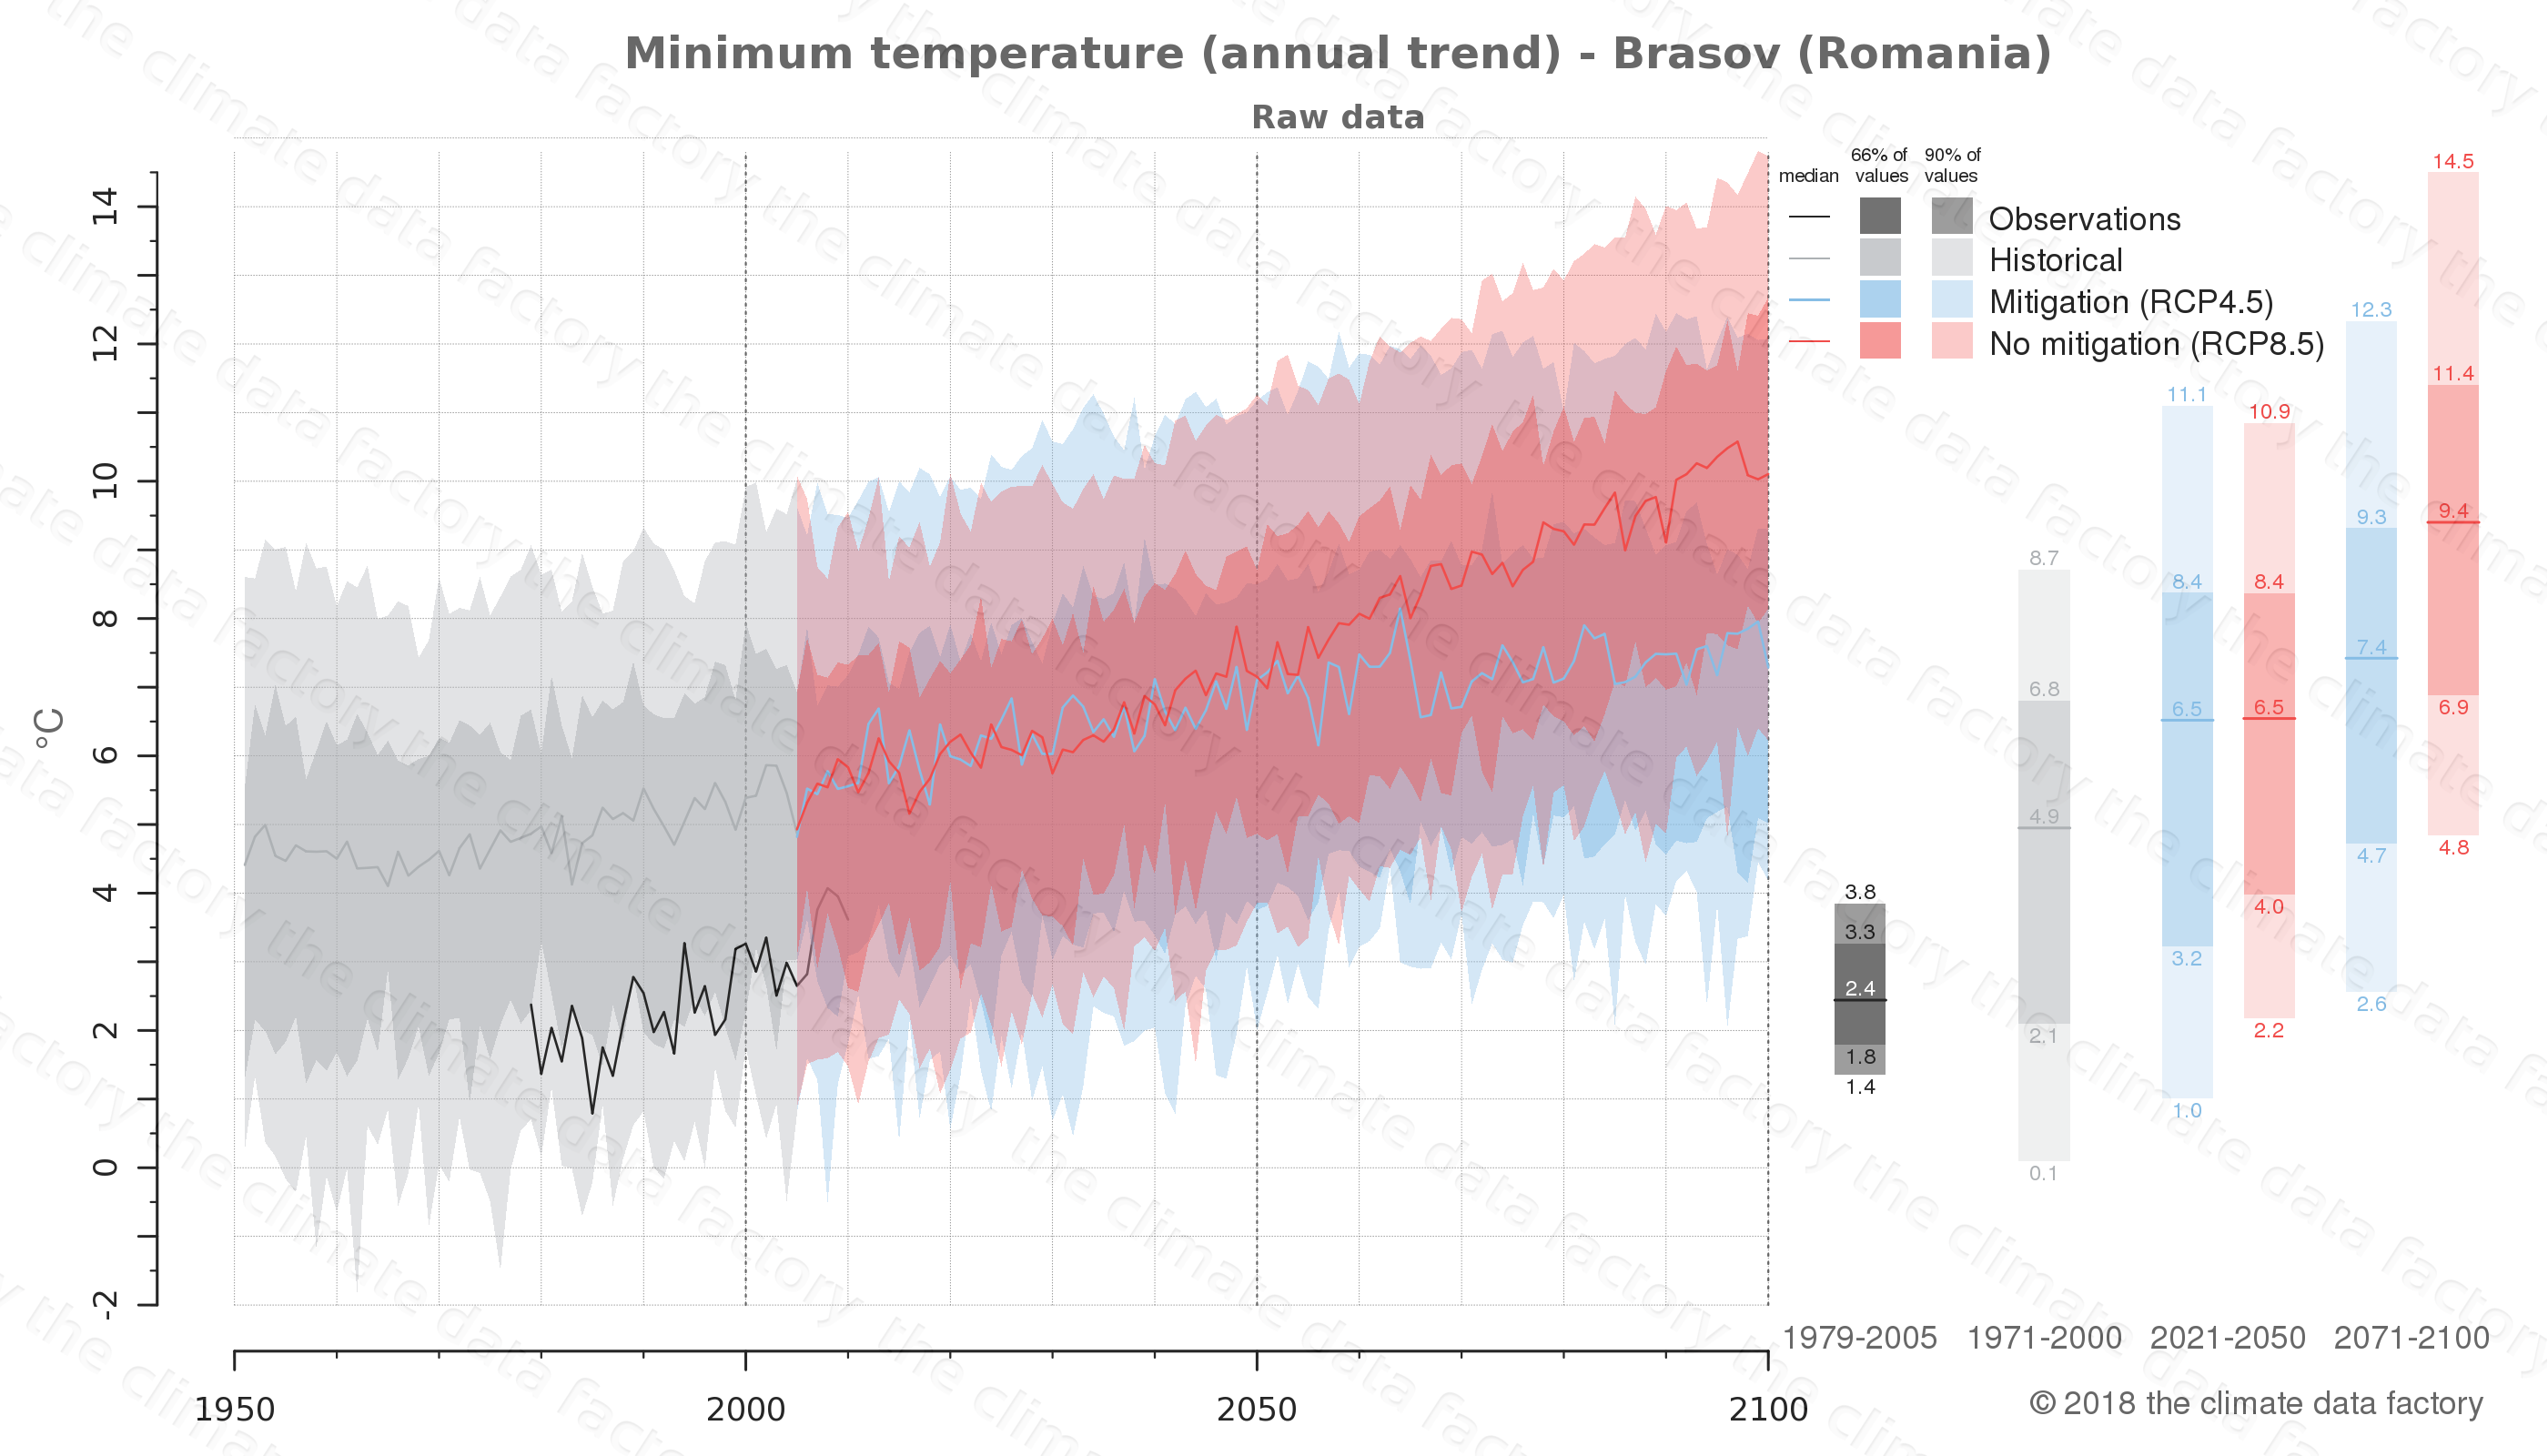 climate change data policy adaptation climate graph city data minimum-temperature brasov romania